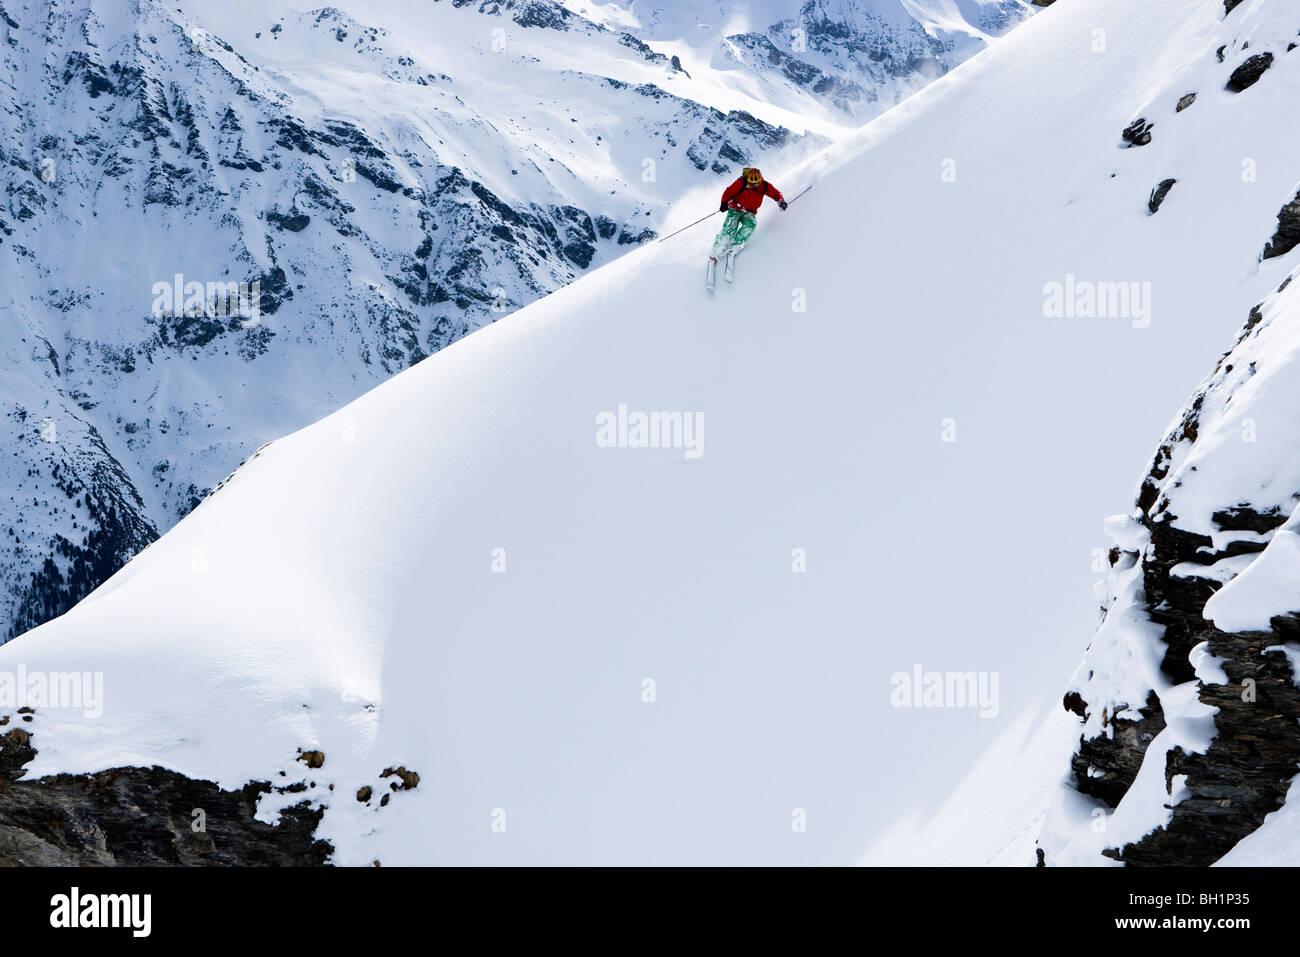 Domaine de Freeride, Zinal, A young man skiing in powder snow, canton Valais, Wallis, Switzerland, Alps, MR - Stock Image